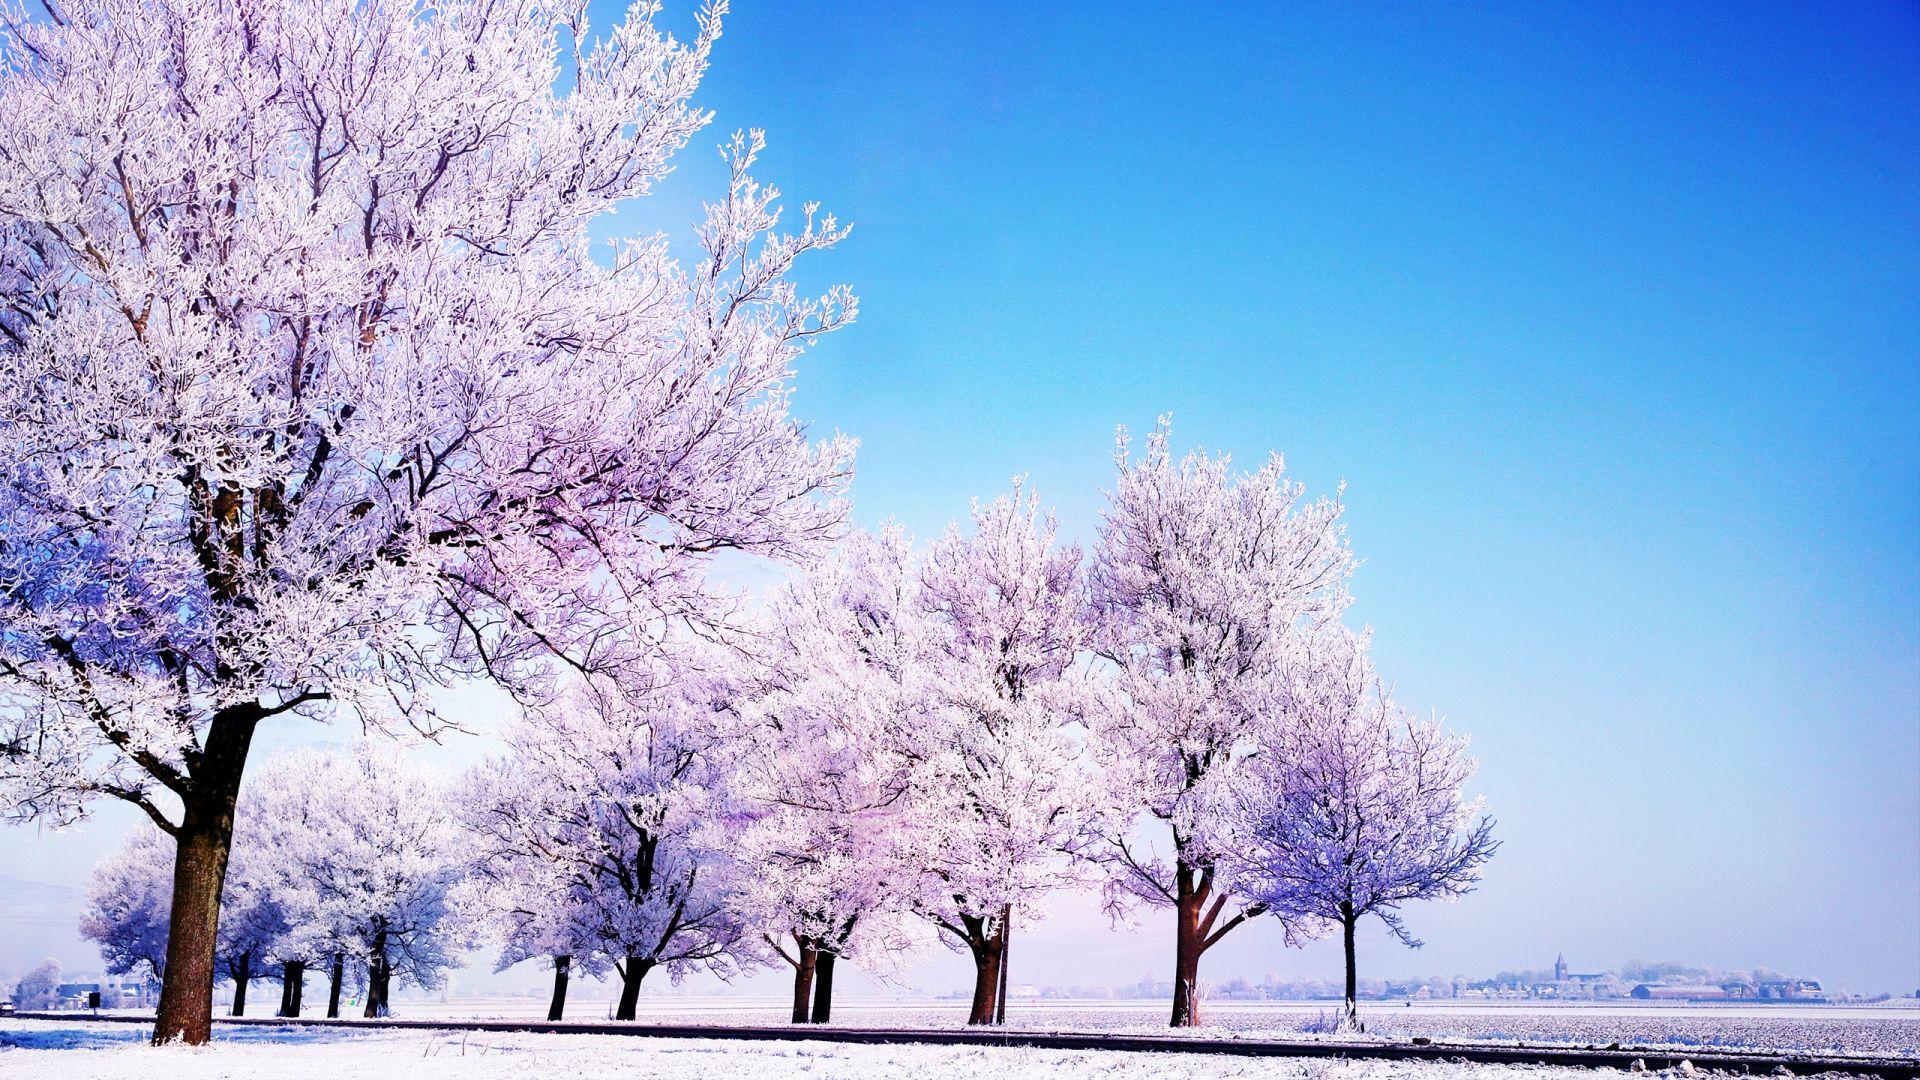 Arbre_en_blanc_-_saison_hiver.jpg